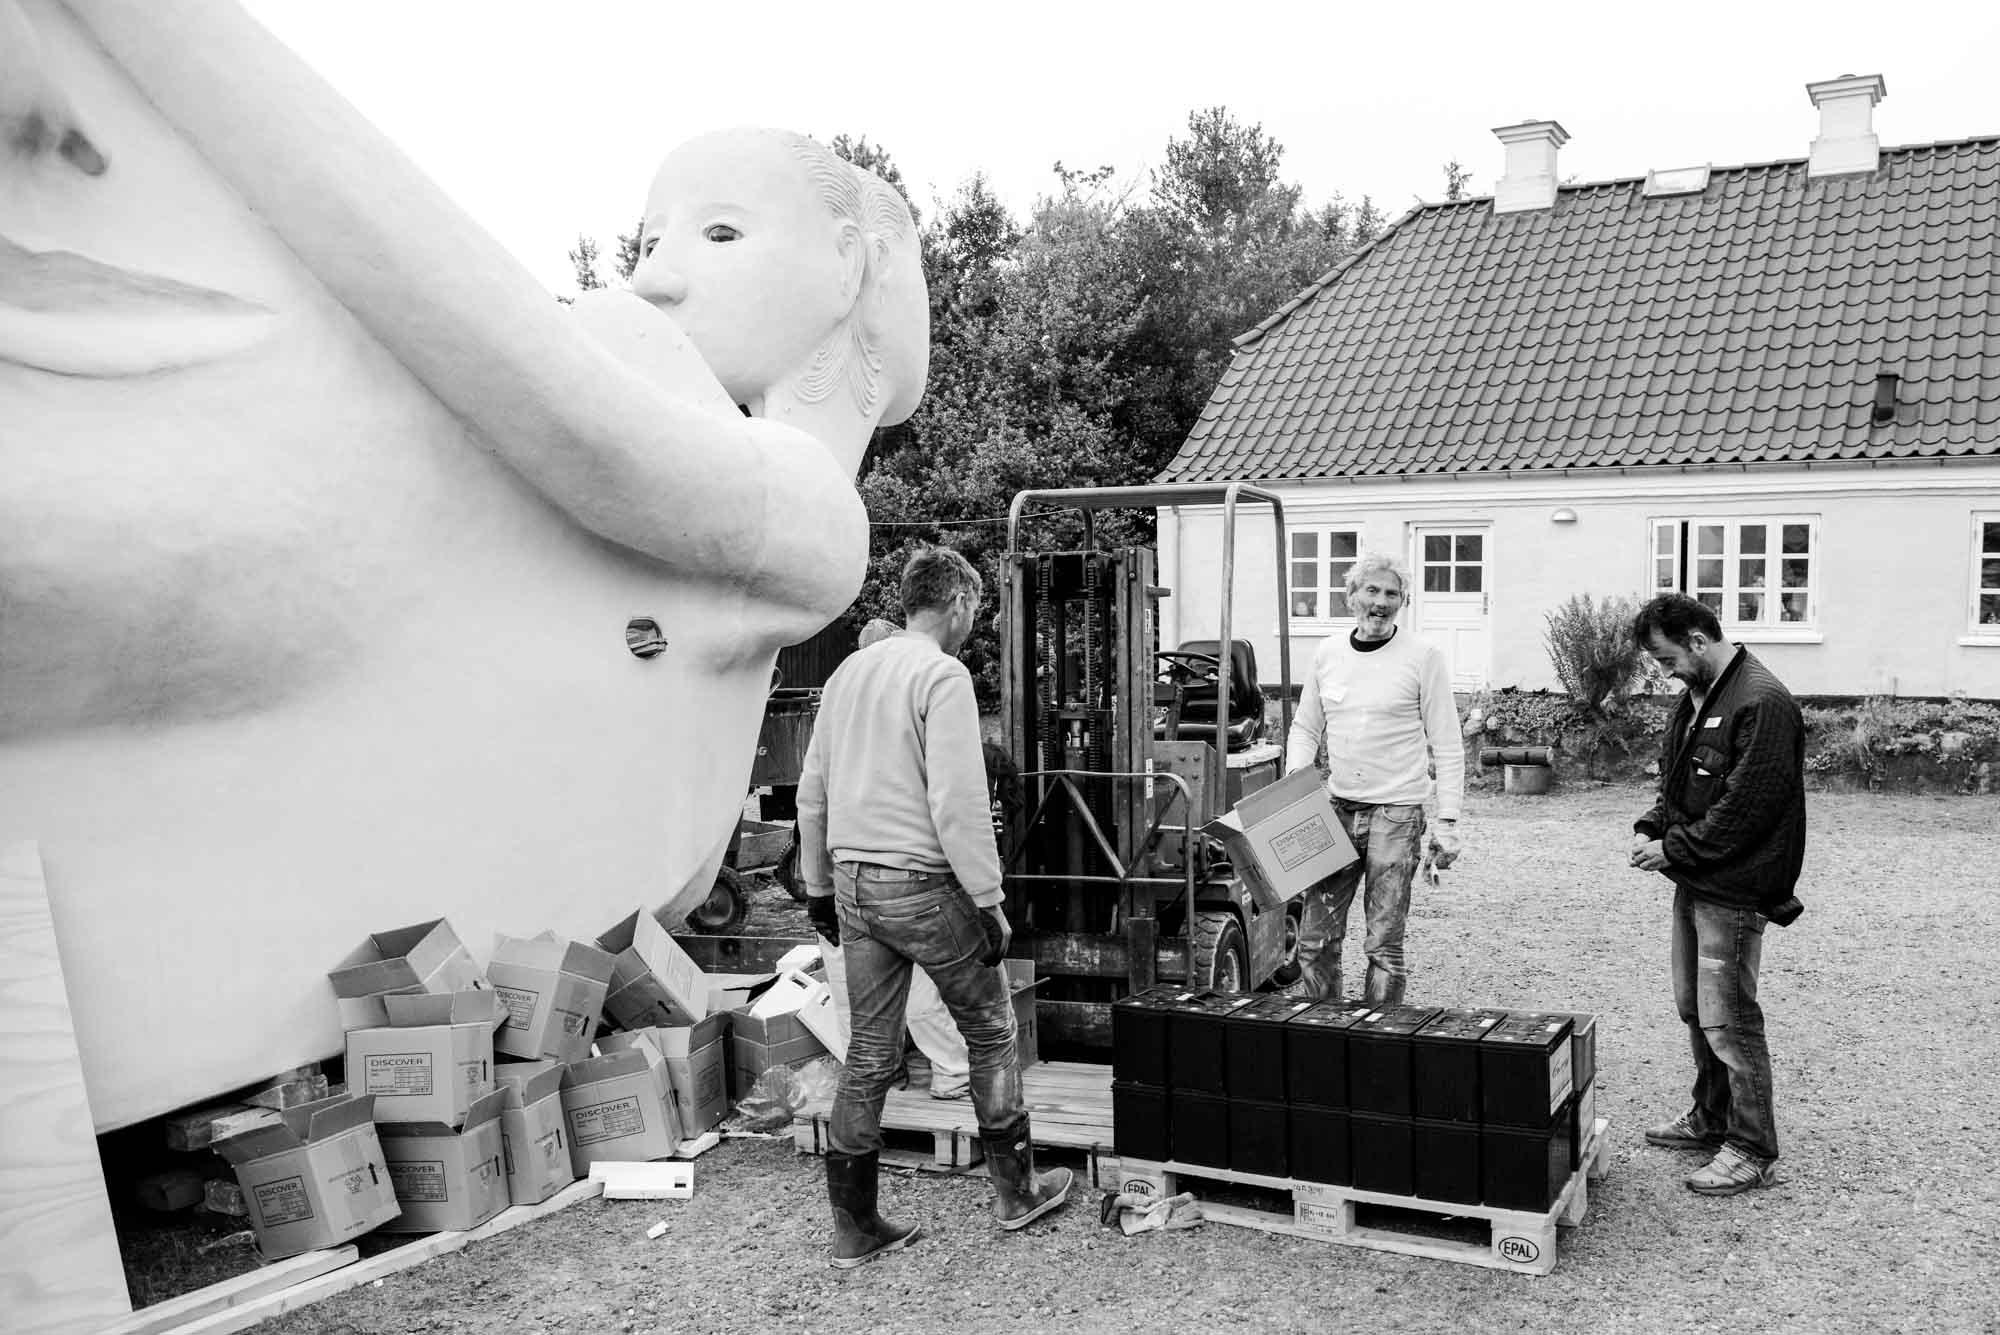 støbning 3, foto Niels Fabæk (12).jpg